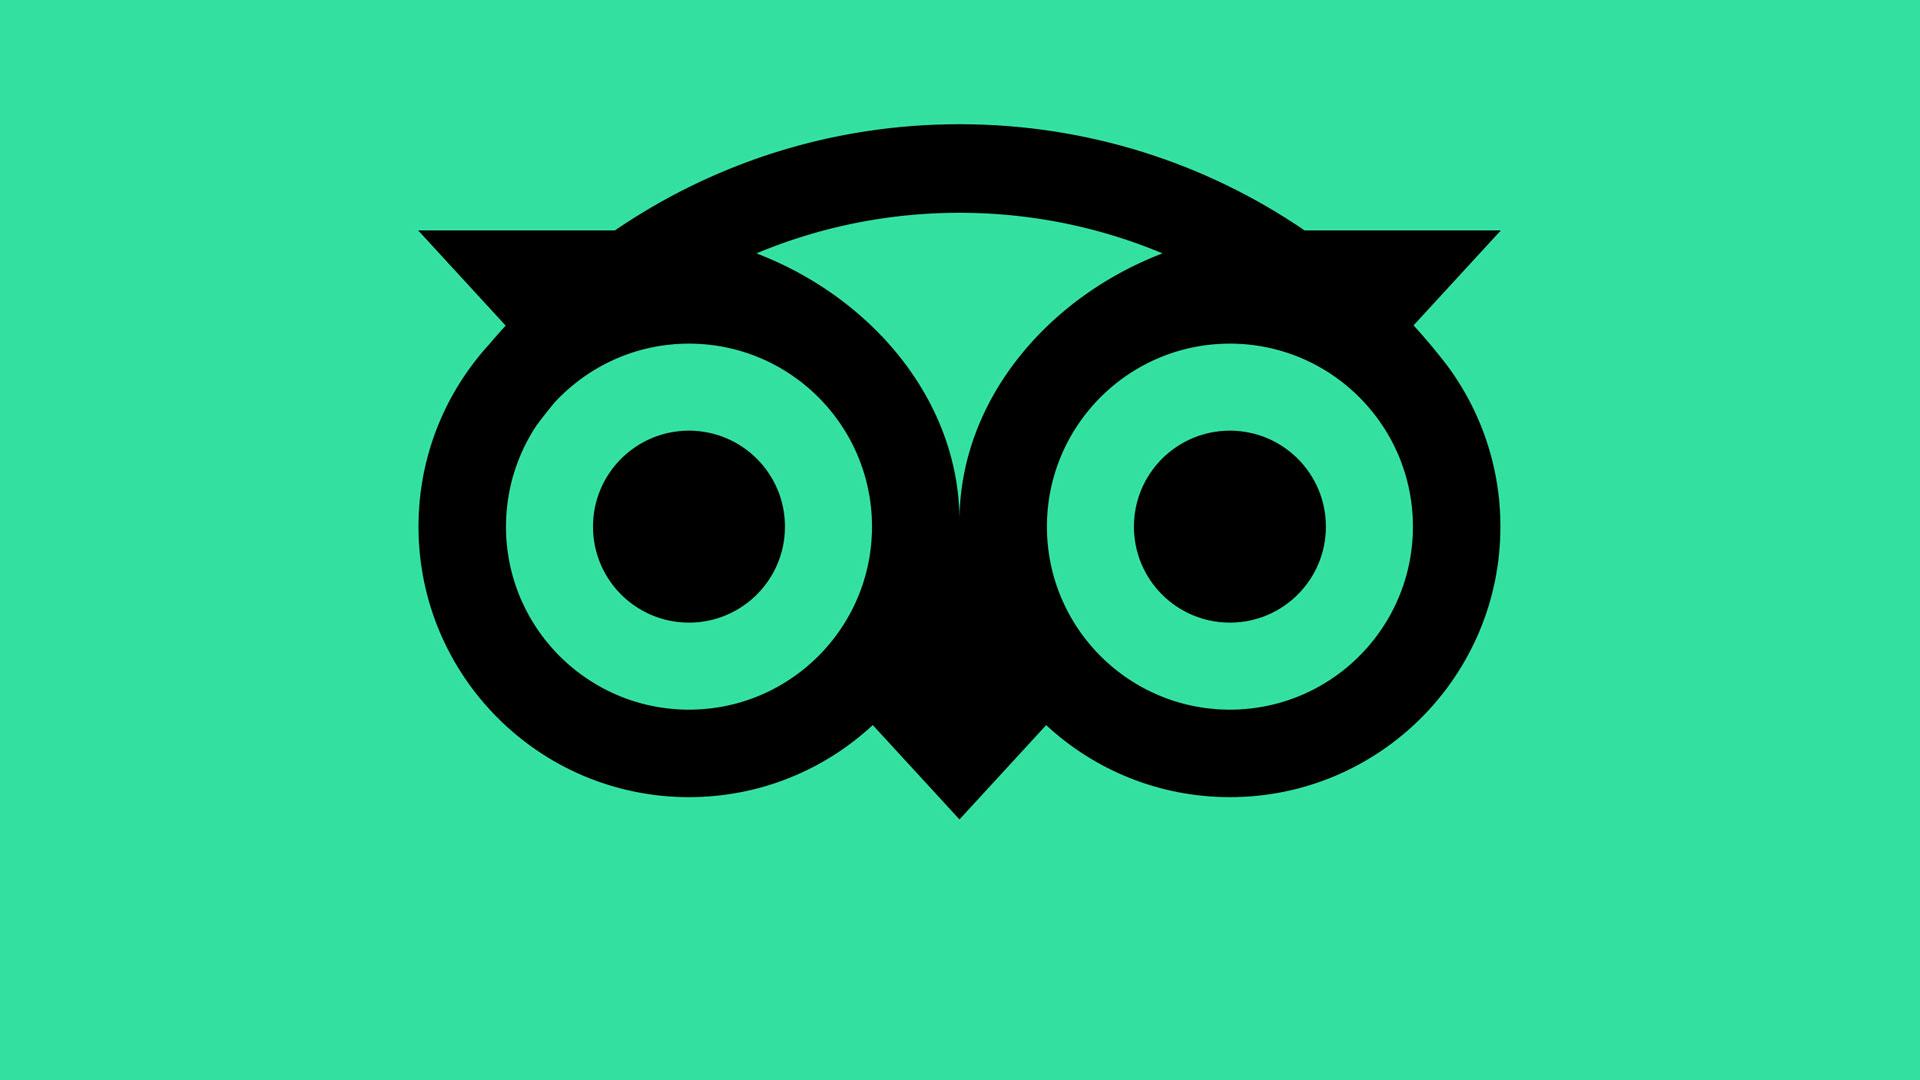 Tripadvisor reveals new logo ahead of year-long identity refresh